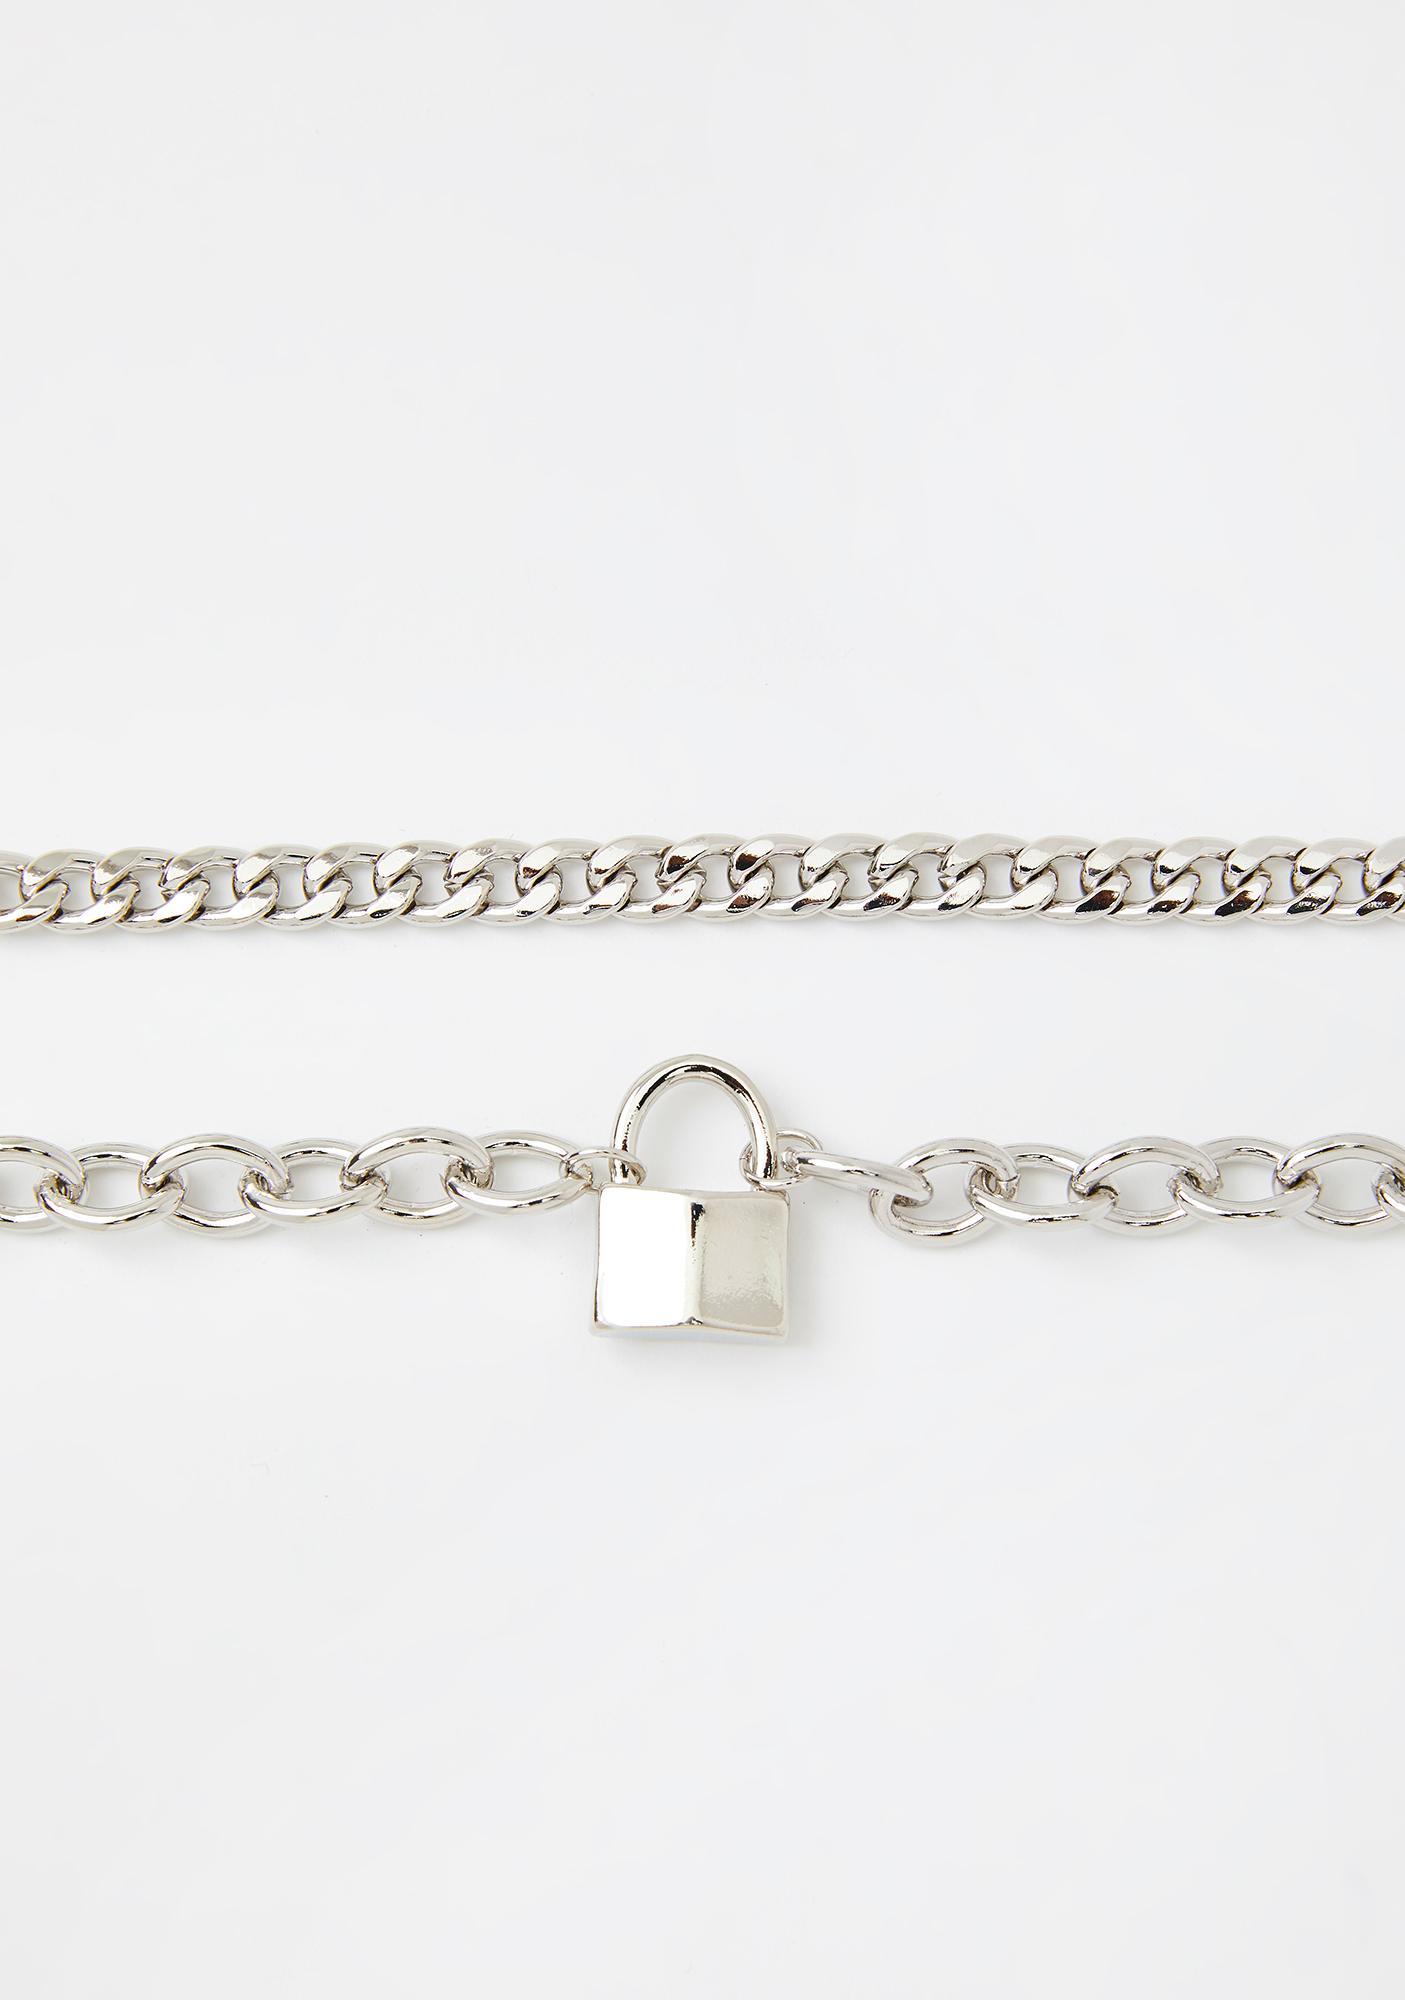 Subtle Intentions Lock Necklace